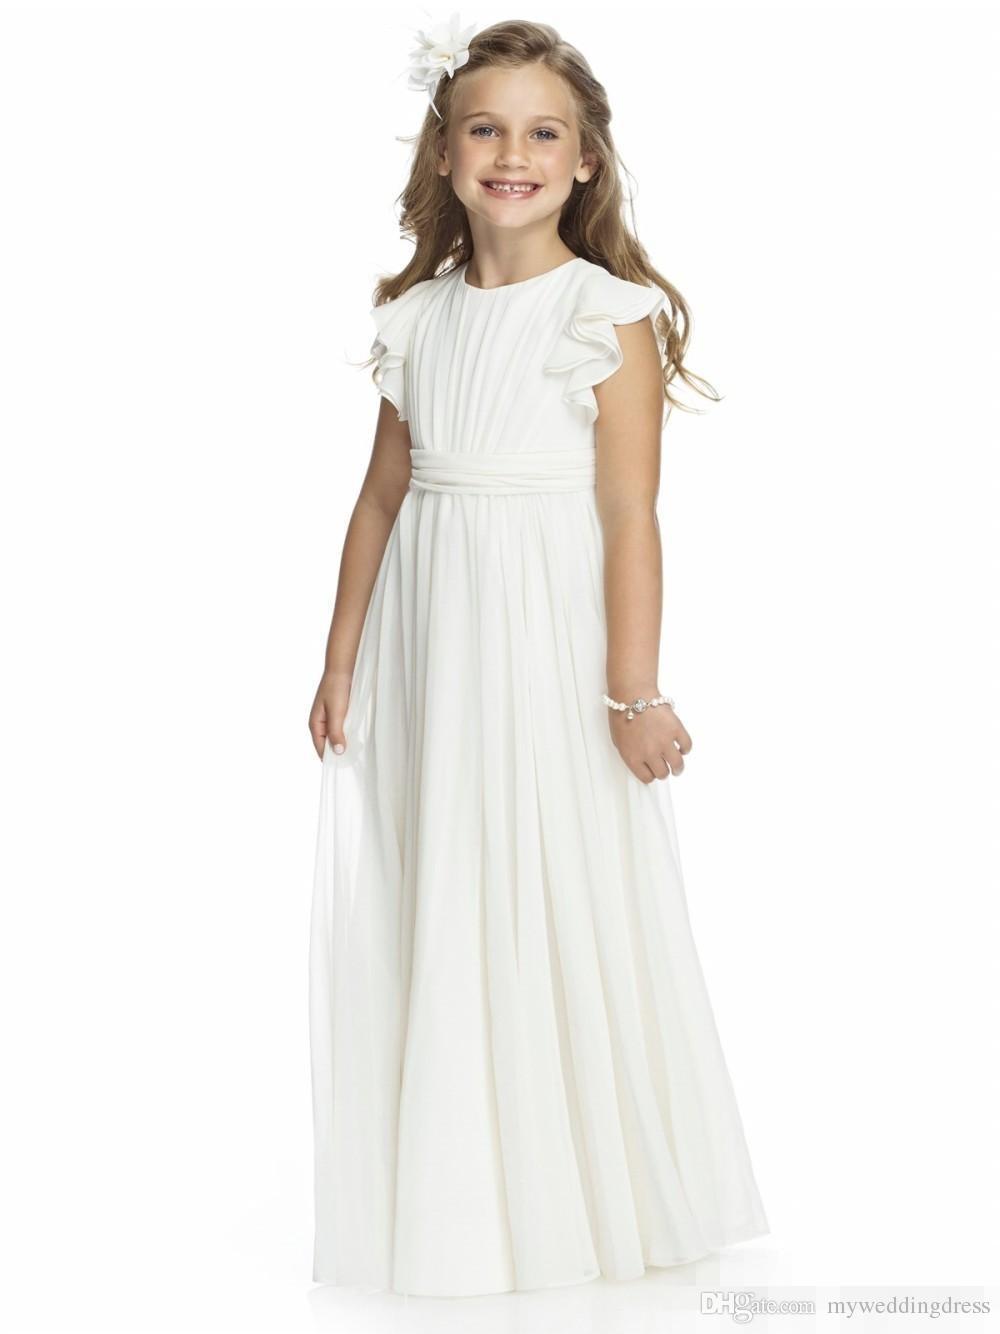 Junior White Dresses Promotion-Shop for Promotional Junior White ...